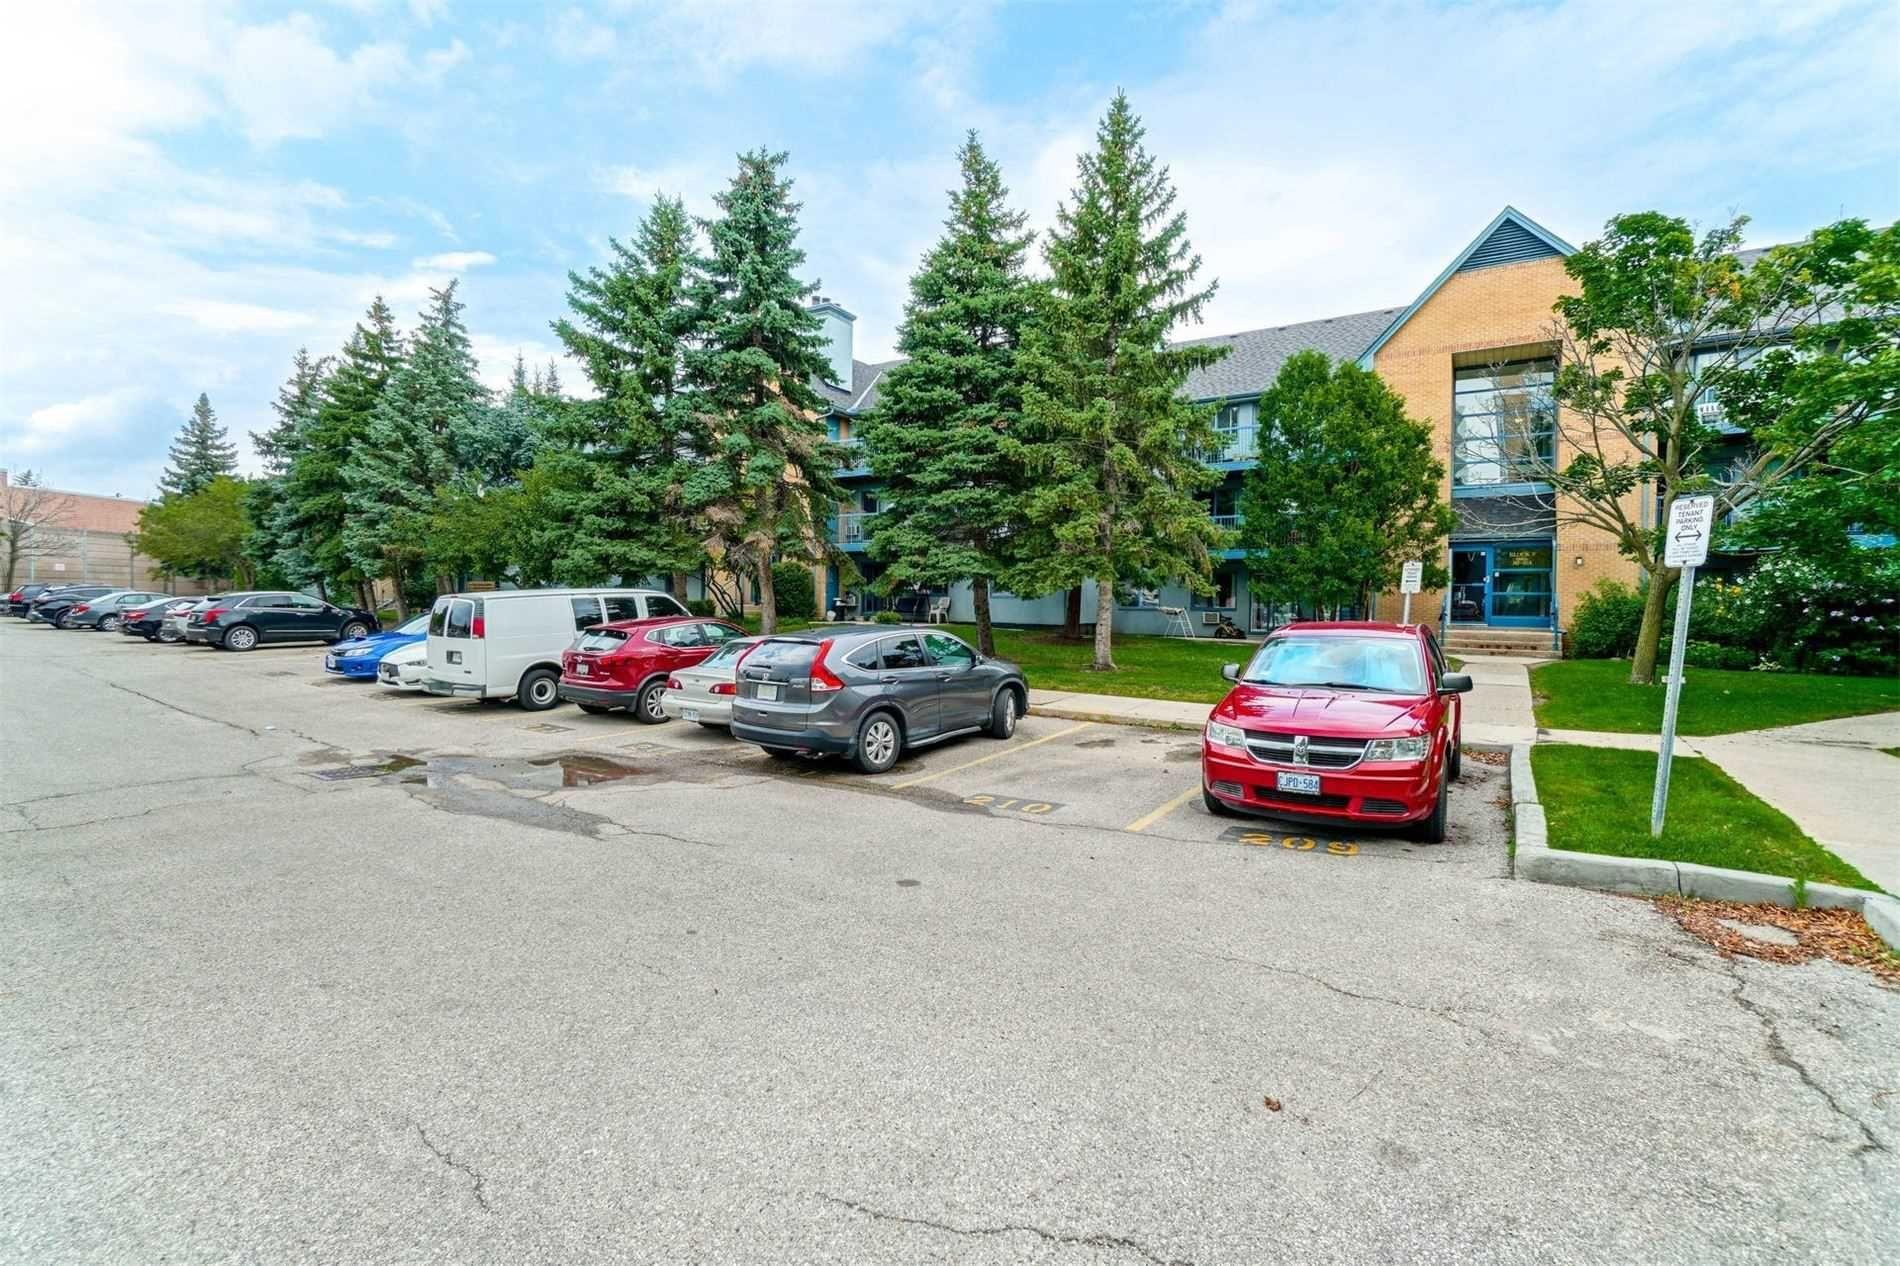 Main Photo: 1021 95 Trailwood Drive in Mississauga: Hurontario Condo for sale : MLS®# W4878419